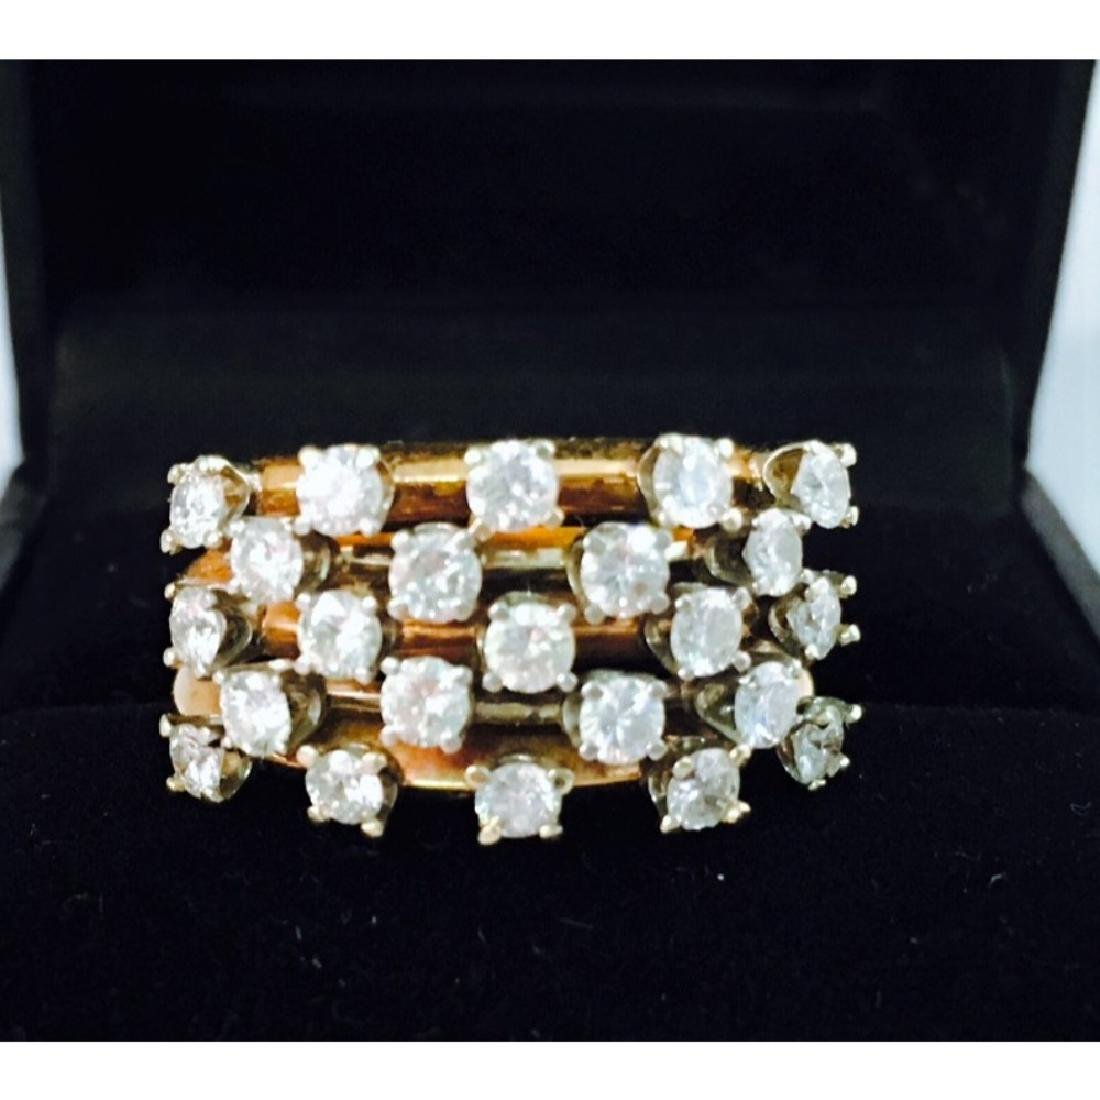 14k Gold, White Diamond Cocktail Ring